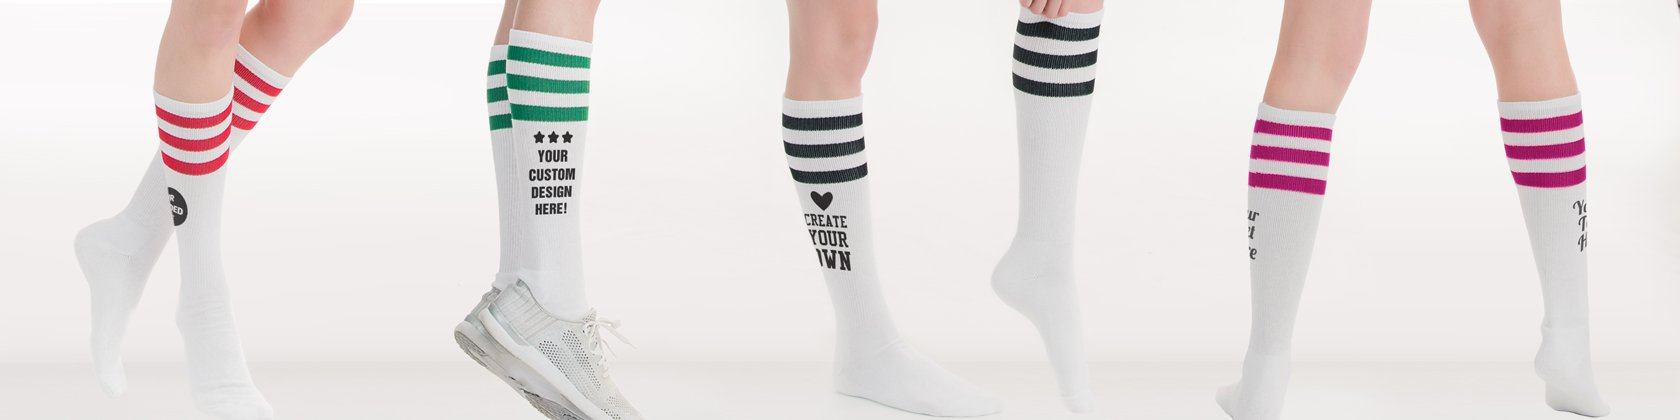 2c3f63f287dd Custom Socks, Personalized Knee High Socks